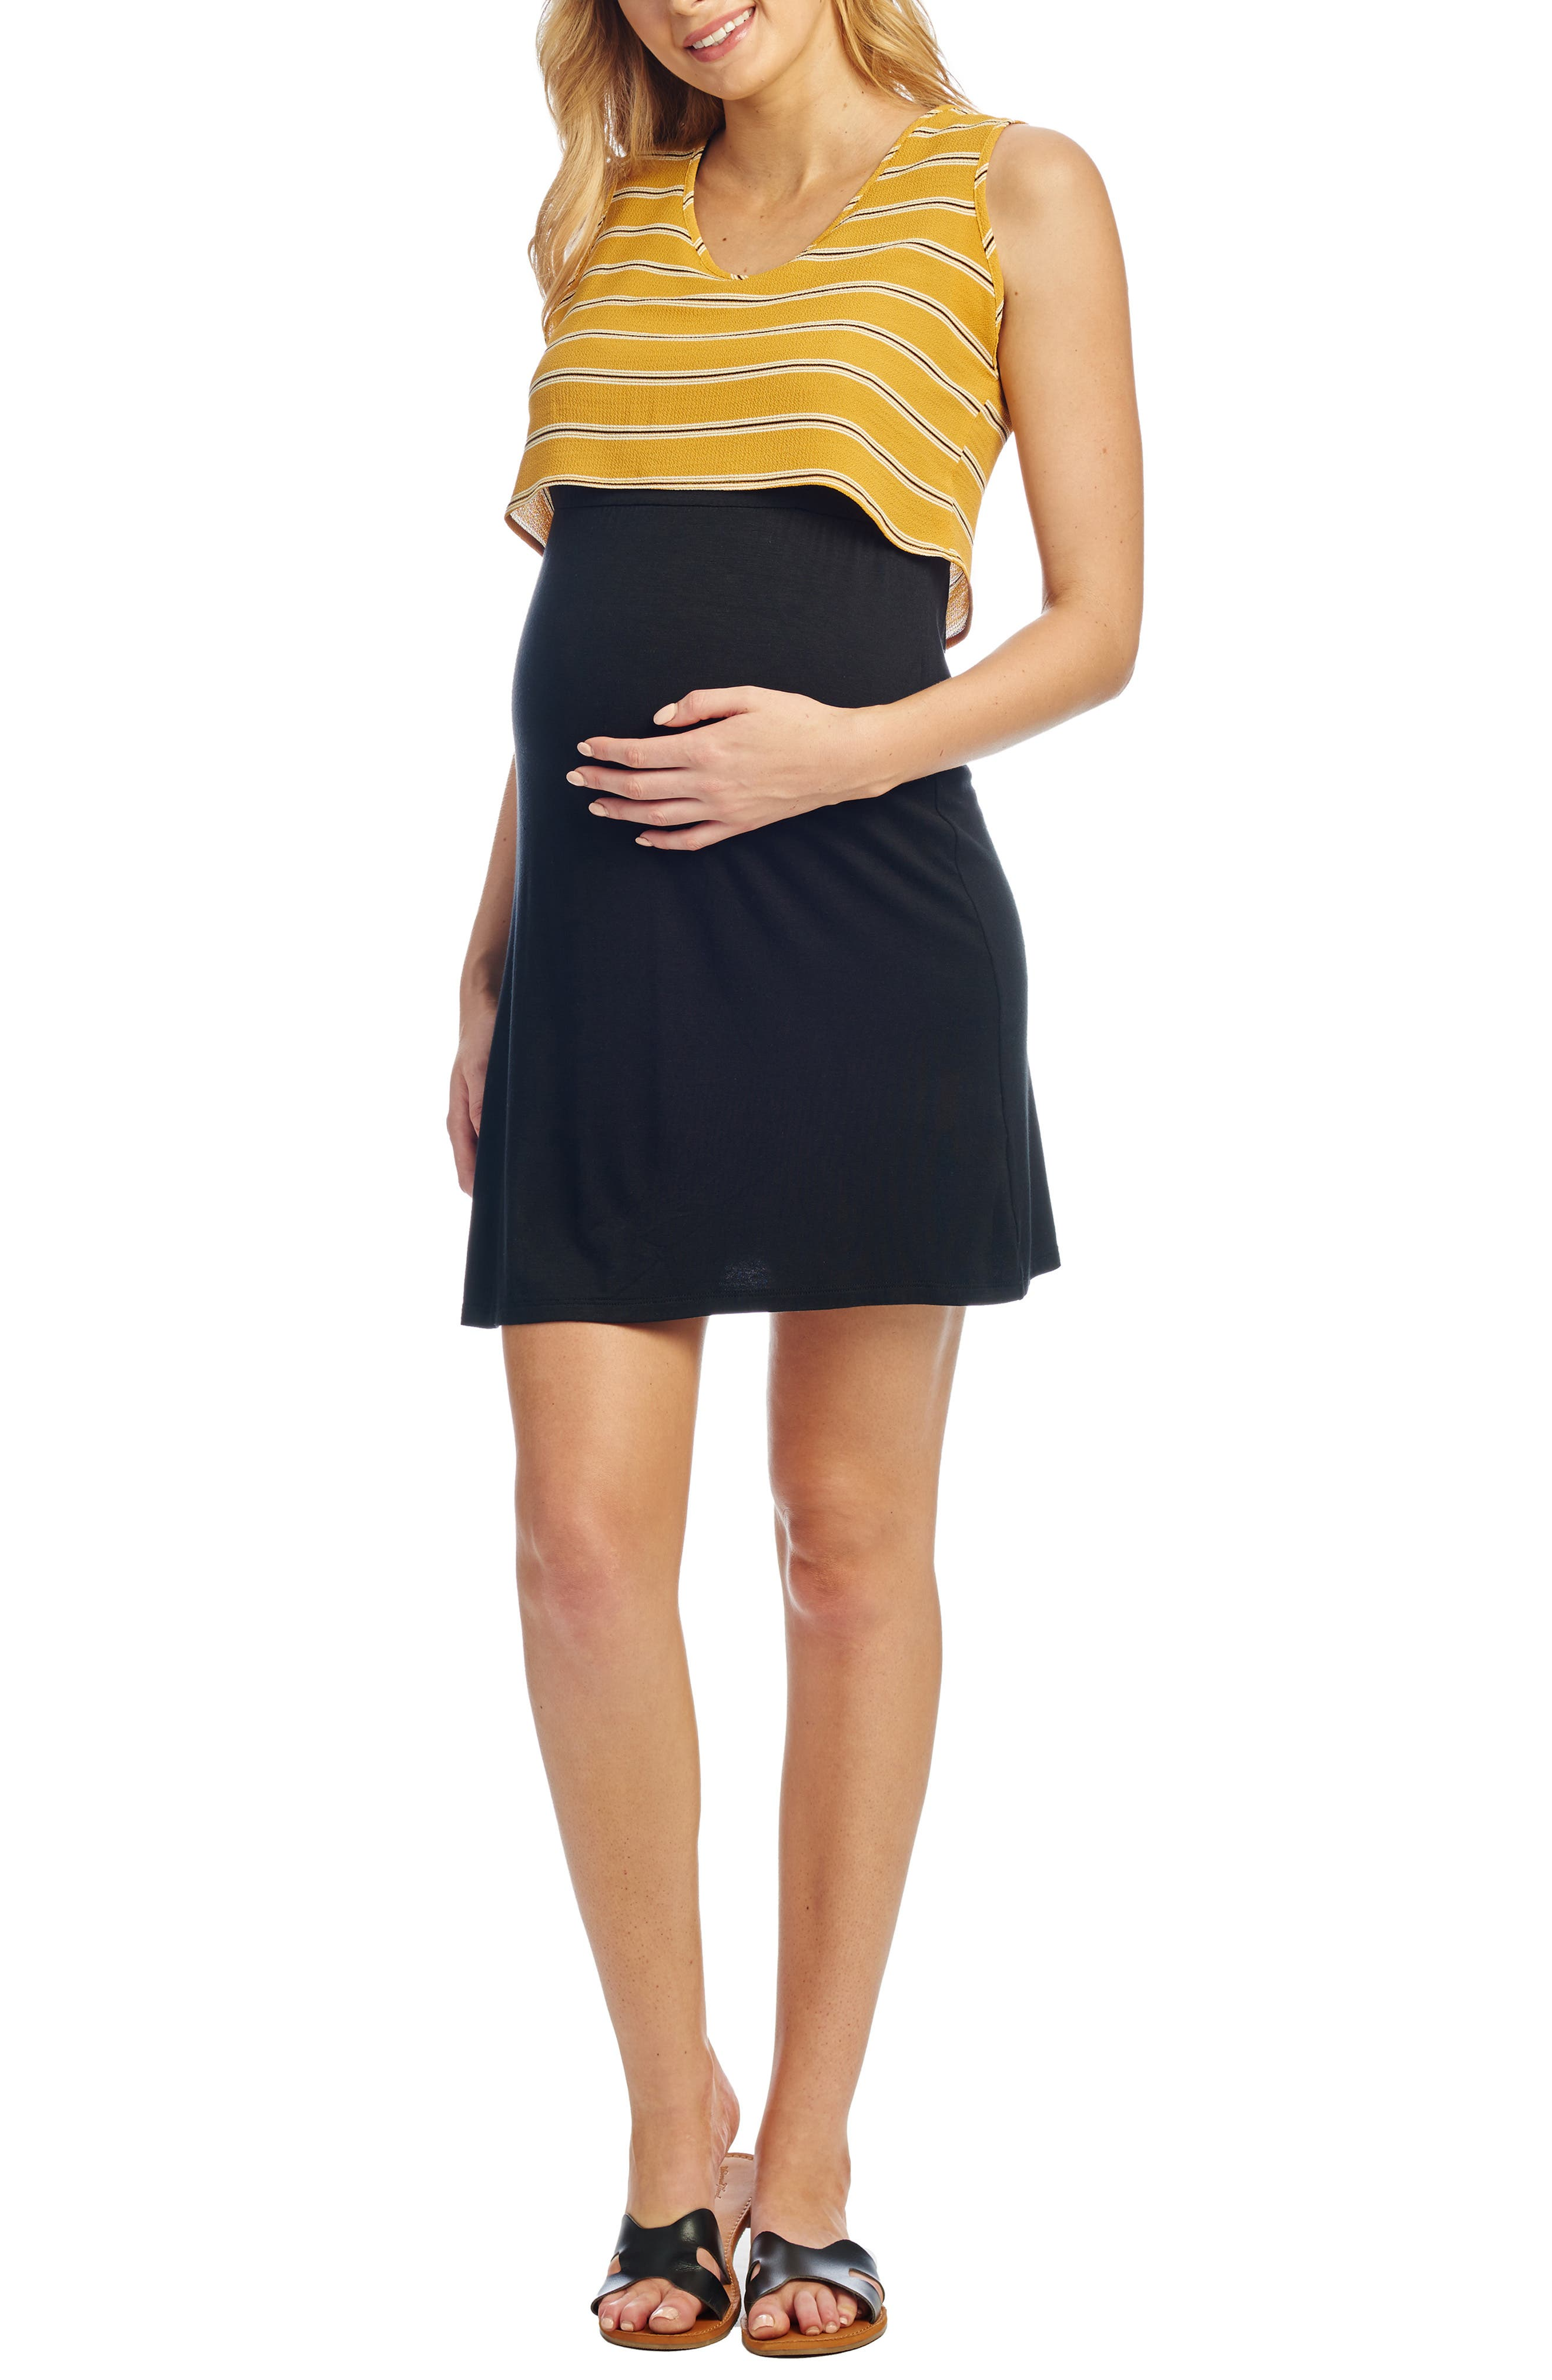 Everly Grey Mahina Maternity/nursing Tank Dress, Yellow